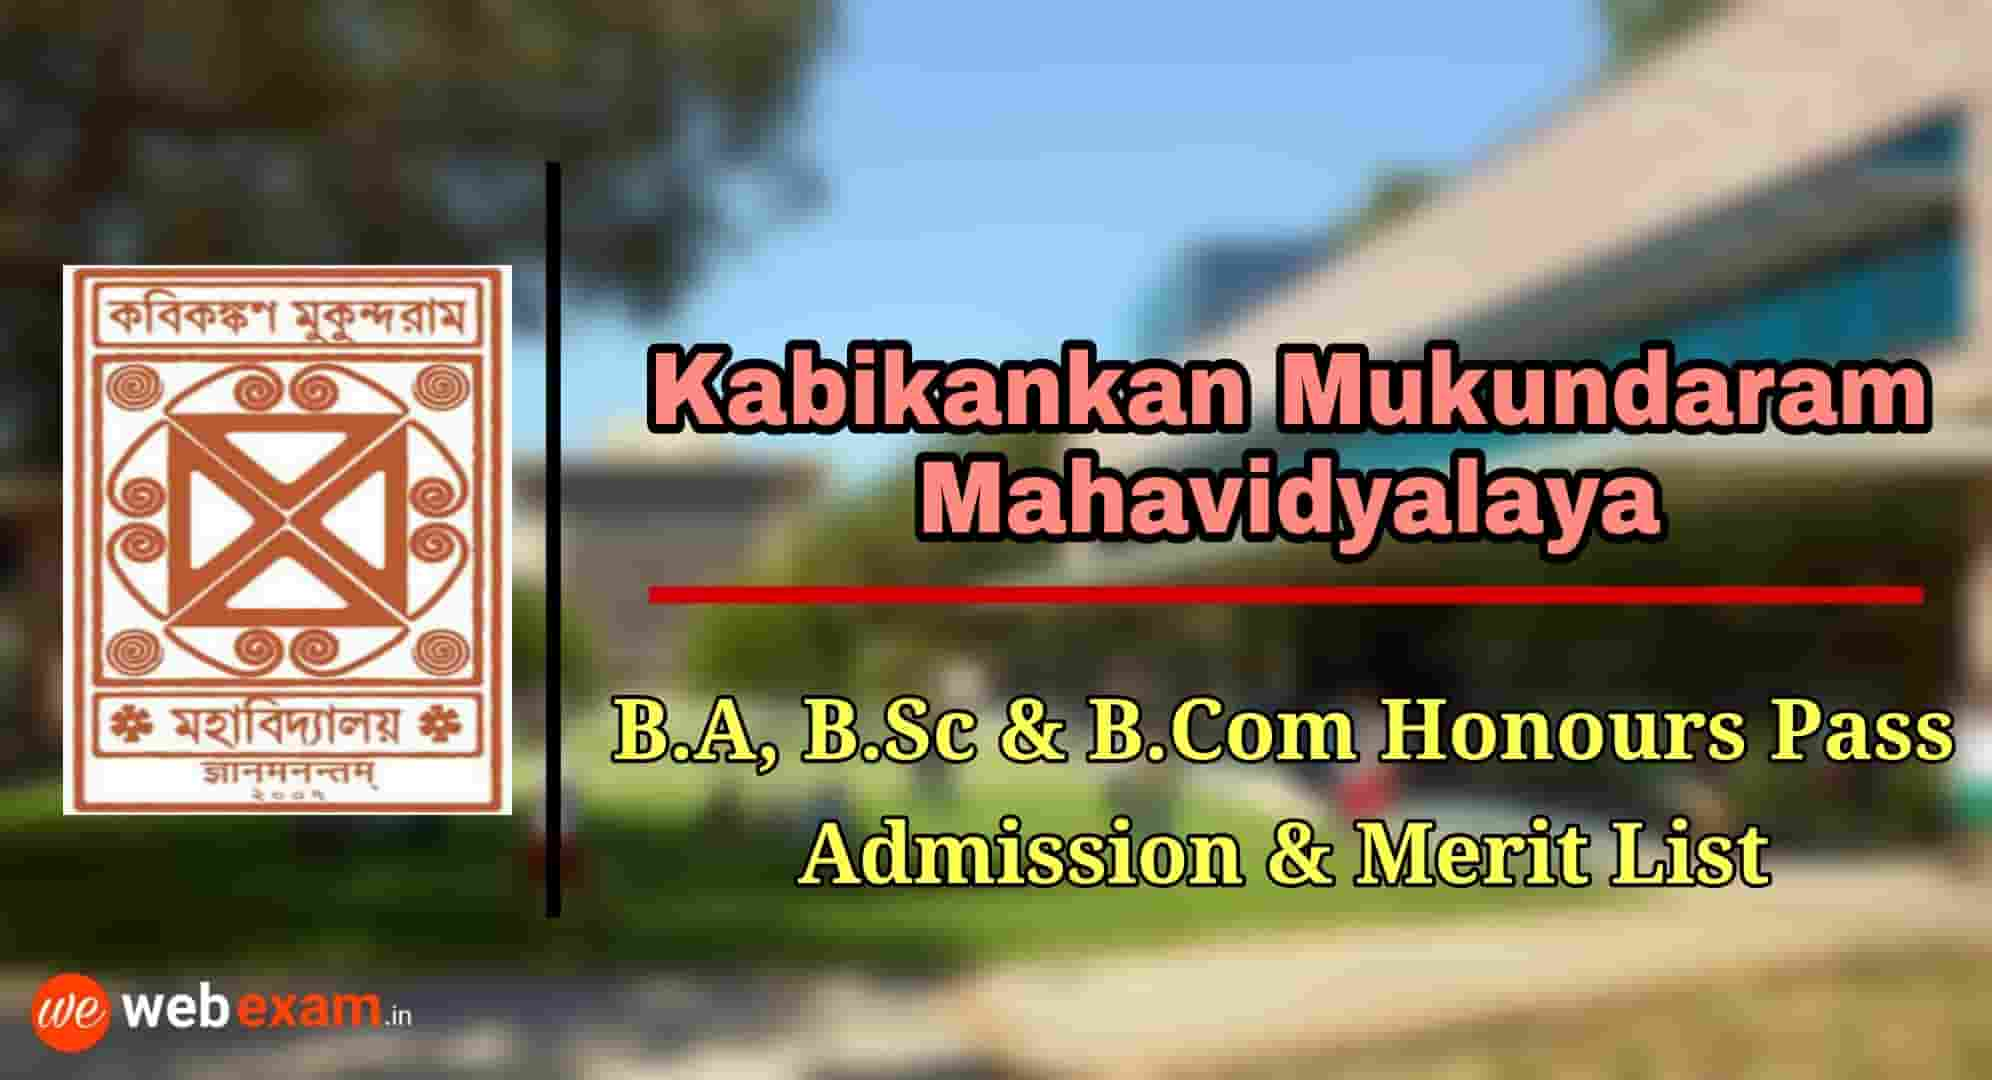 Kabikankan Mukundaram Mahavidyalaya Admission